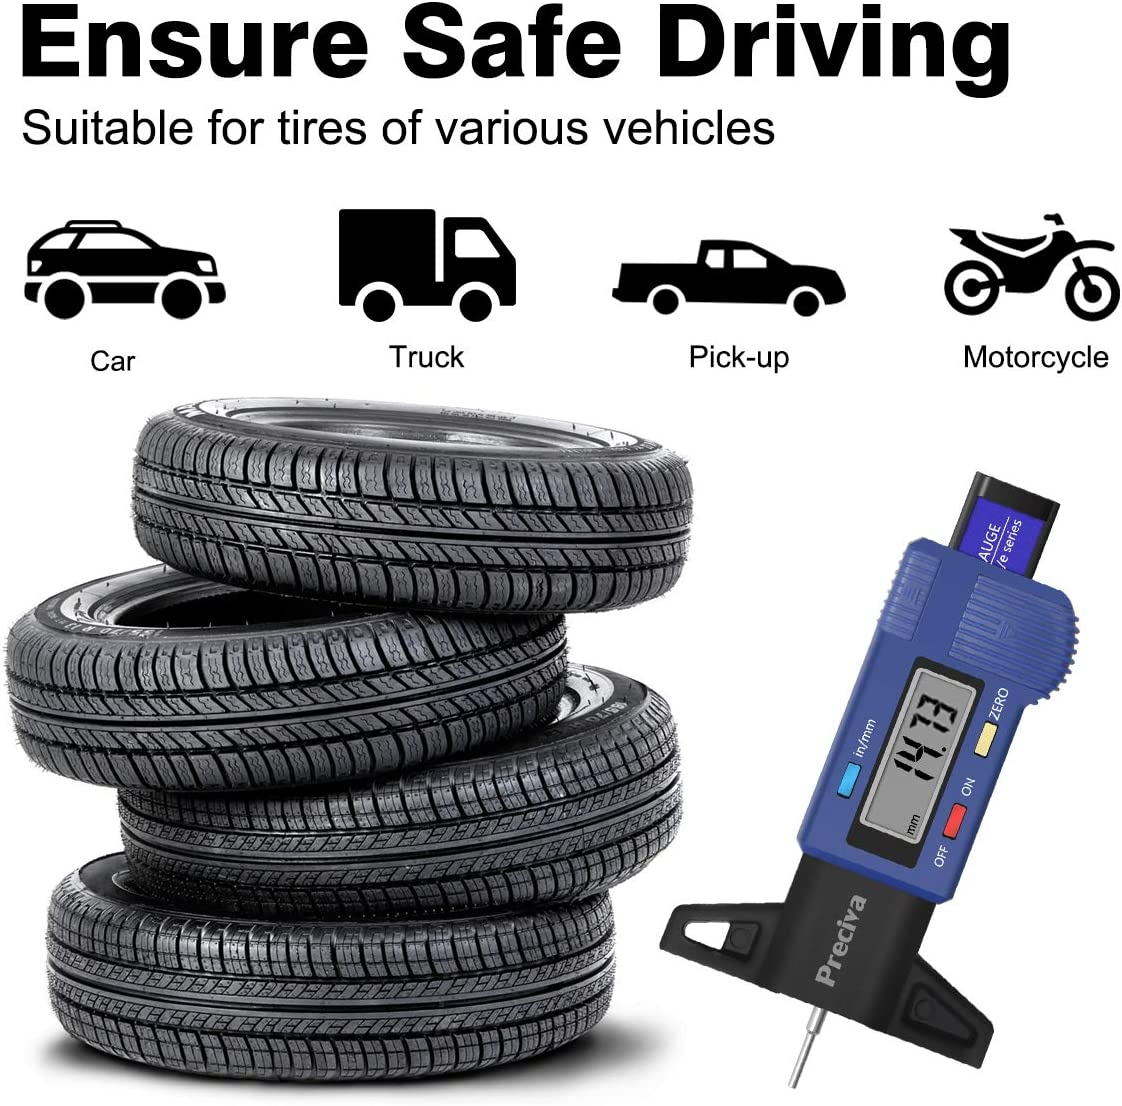 BCVBFGCXVB Easy To Carry 1Pcs Tyre Depth Gauge Car Tyre Tire Depth Gauge Car Tire Tread Depth Gauge Caliper Silver